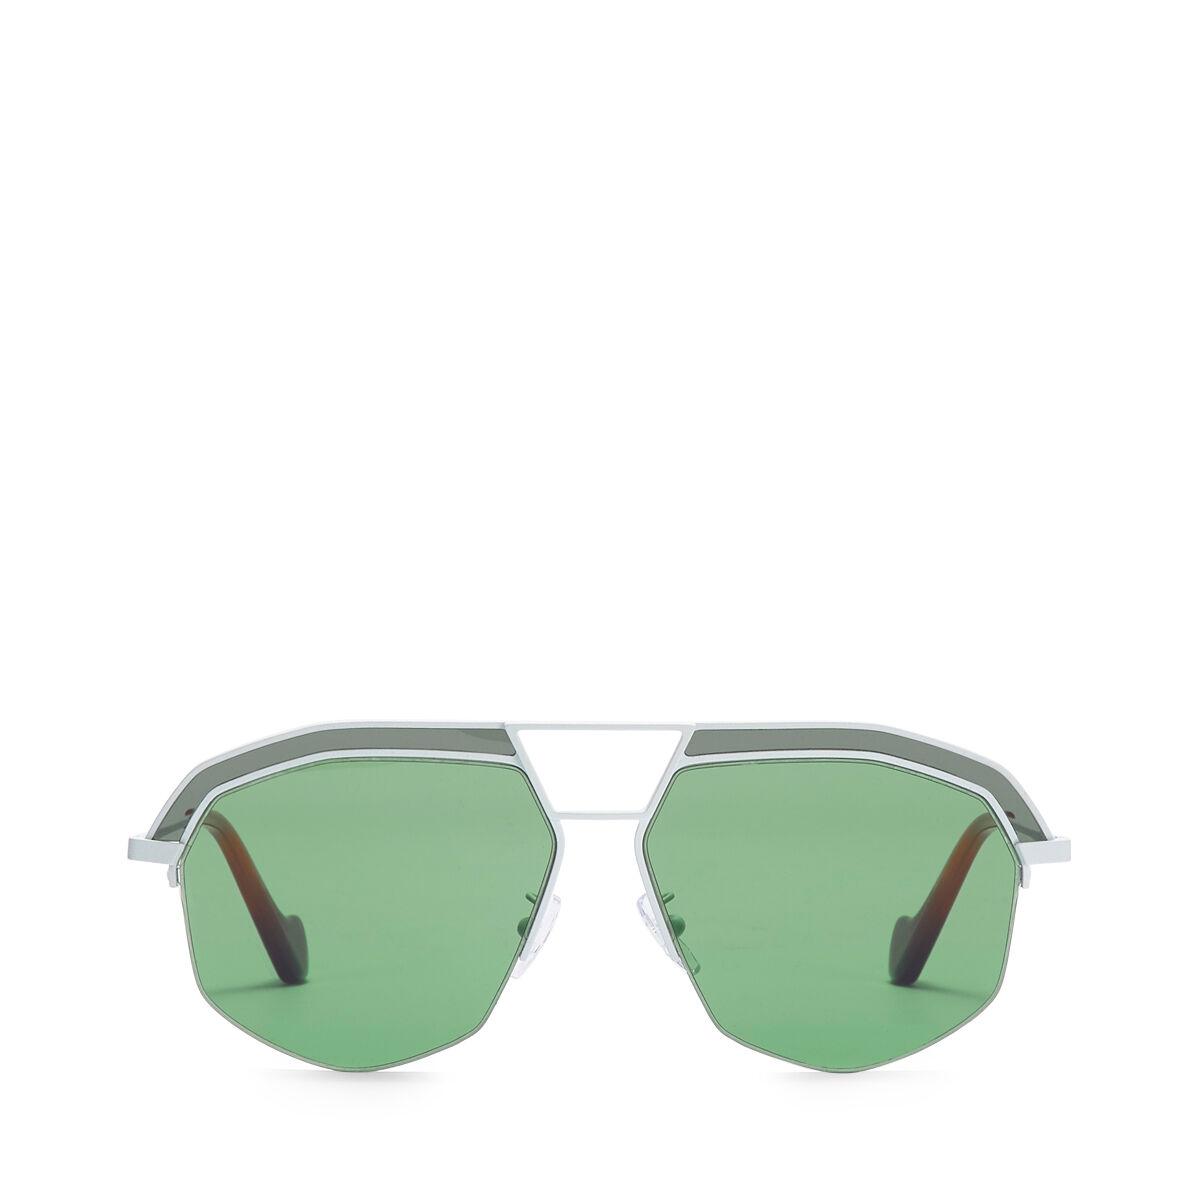 LOEWE サングラス Optical White/Bright Green all